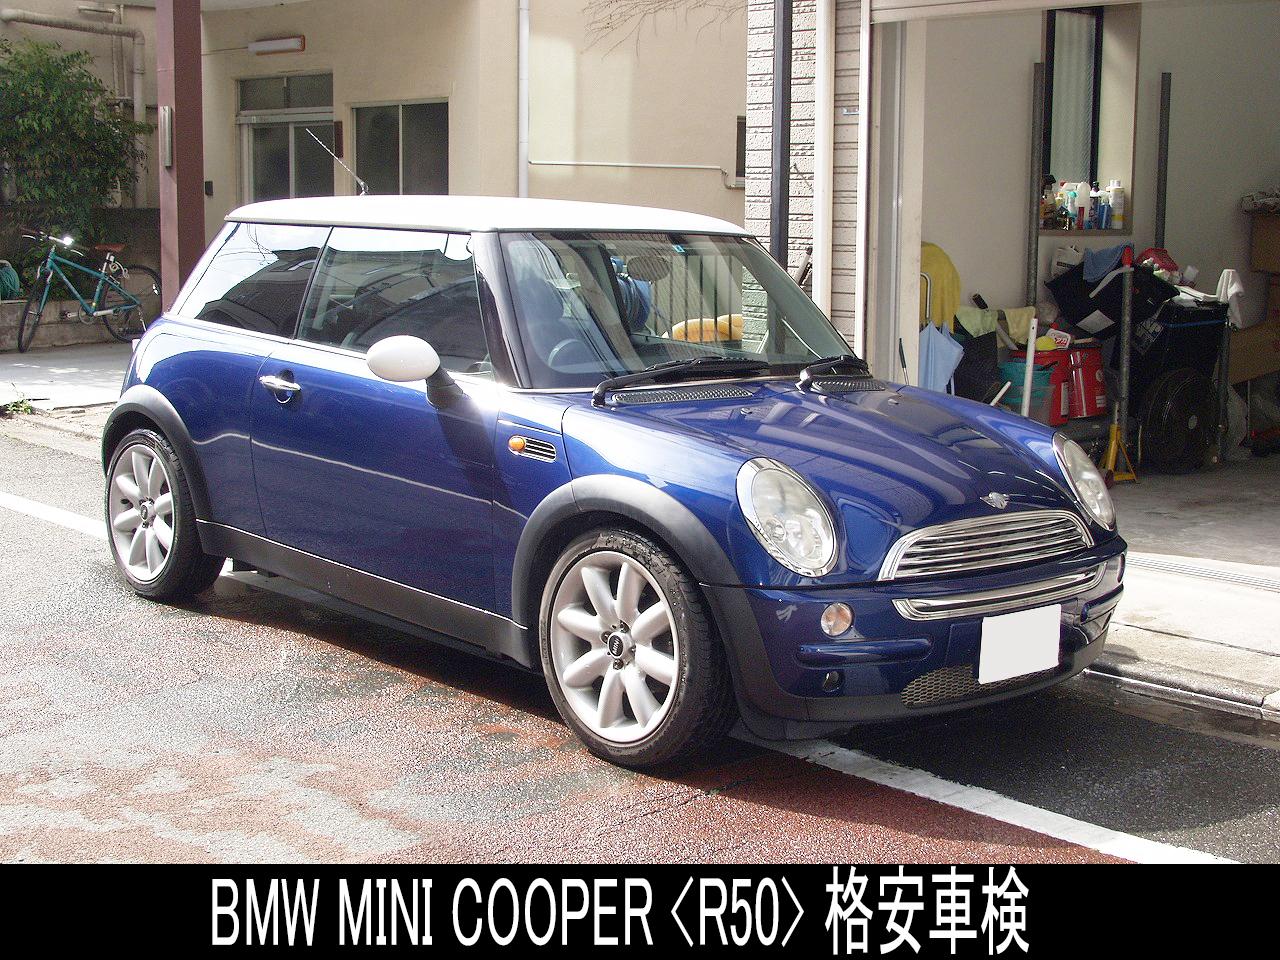 BMW MINI COOPER / ミニ・クーパー(R50)格安車検事例画像